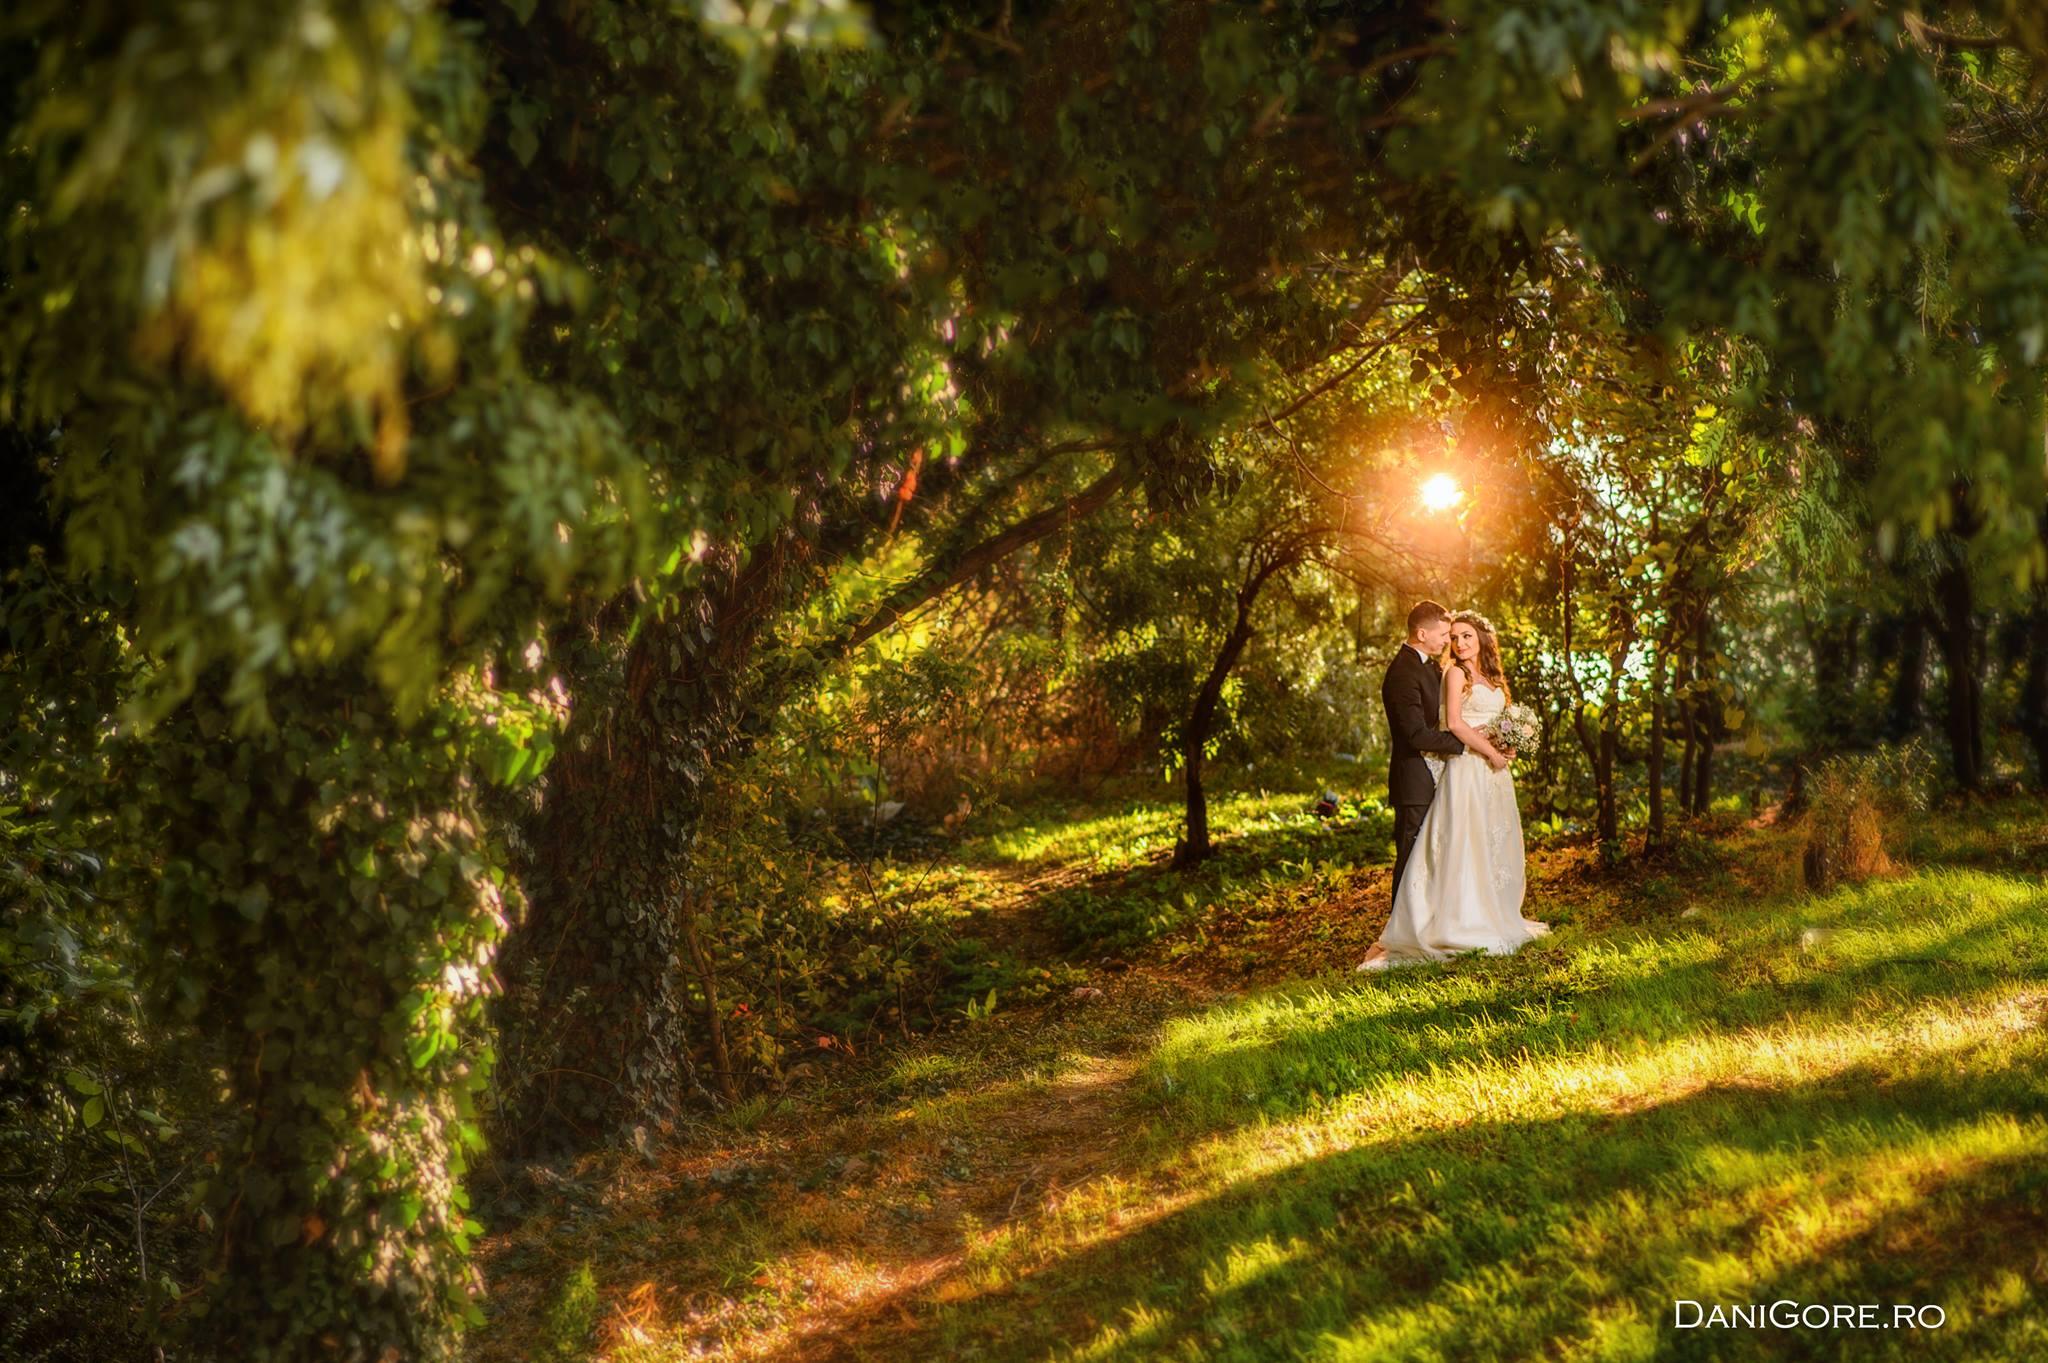 Dani Gore, imagini de nunta din Romania